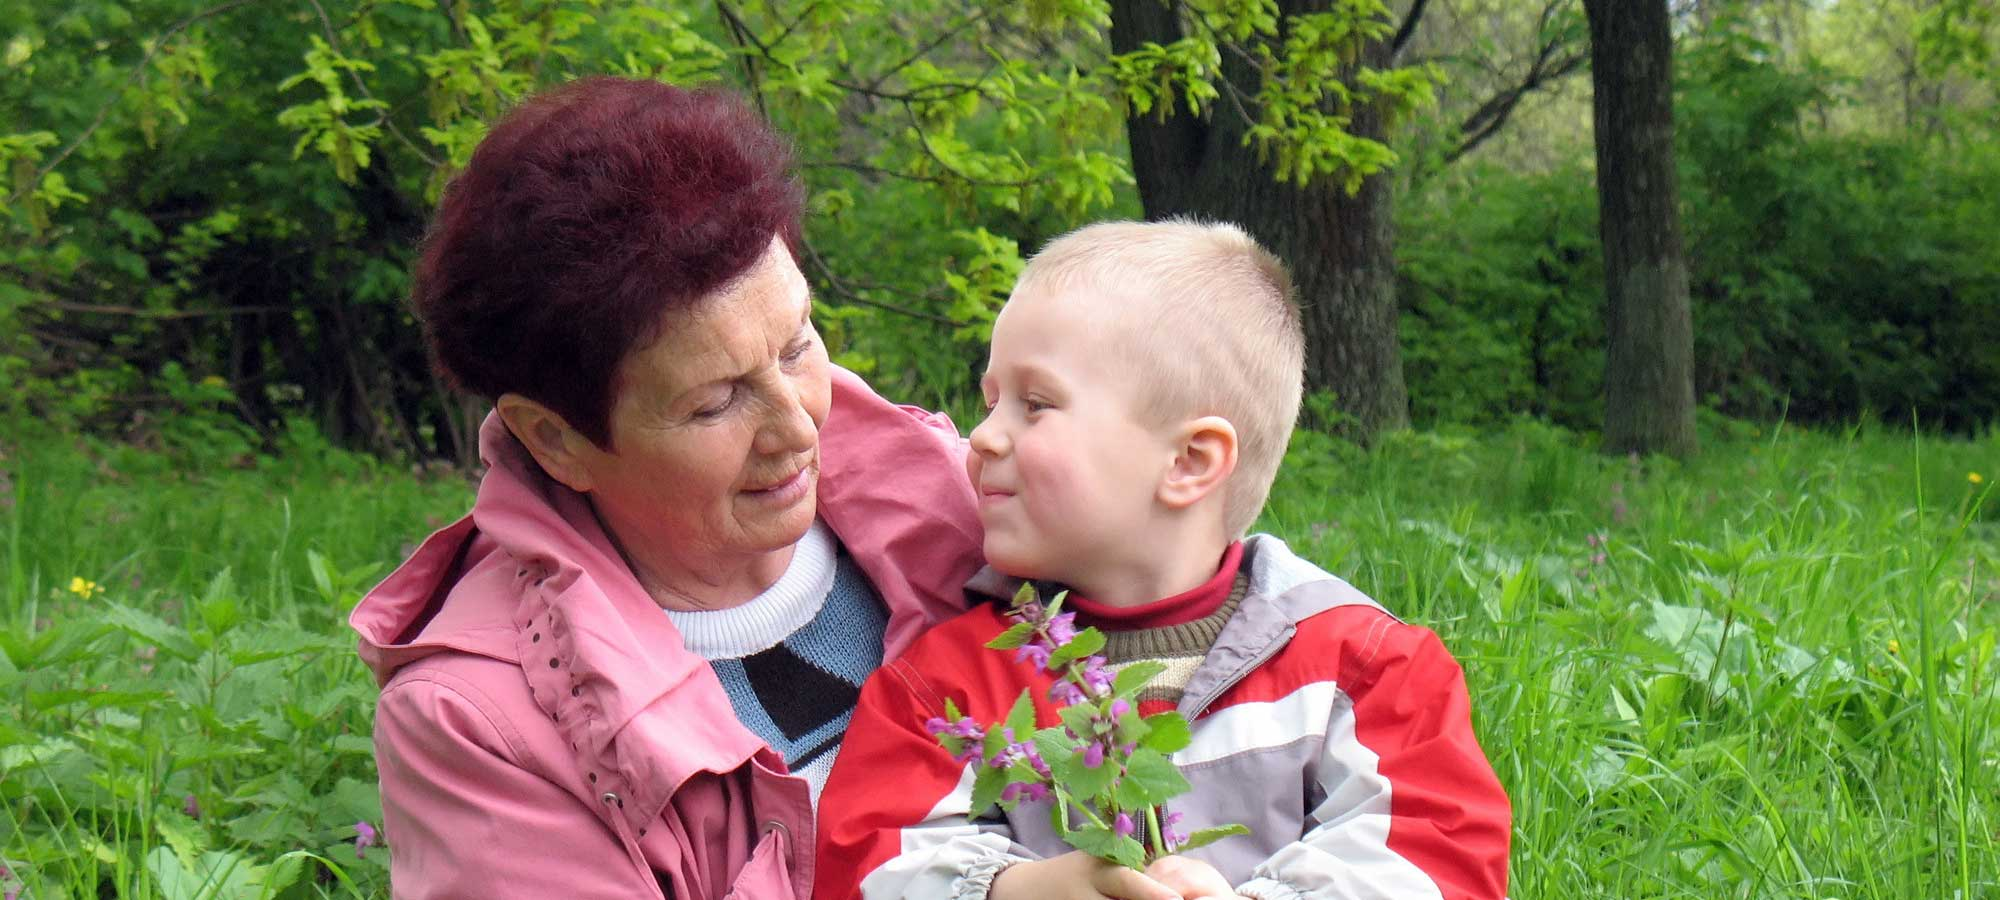 Woman%2C Grandson%2C Garden.jpg